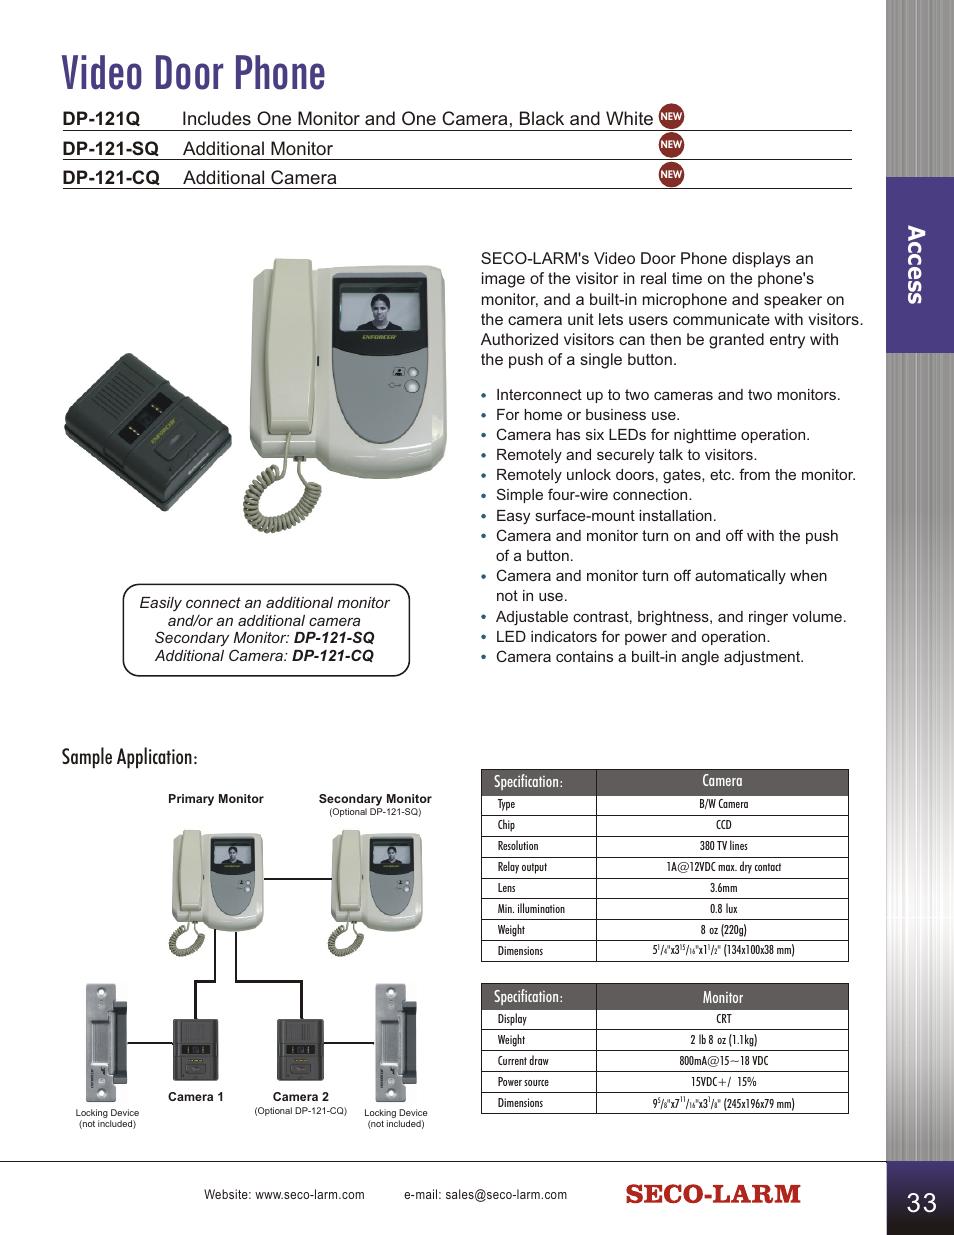 video door phone access sample application seco larm usa surface rh manualsdir com Owner's Manual User Manual PDF